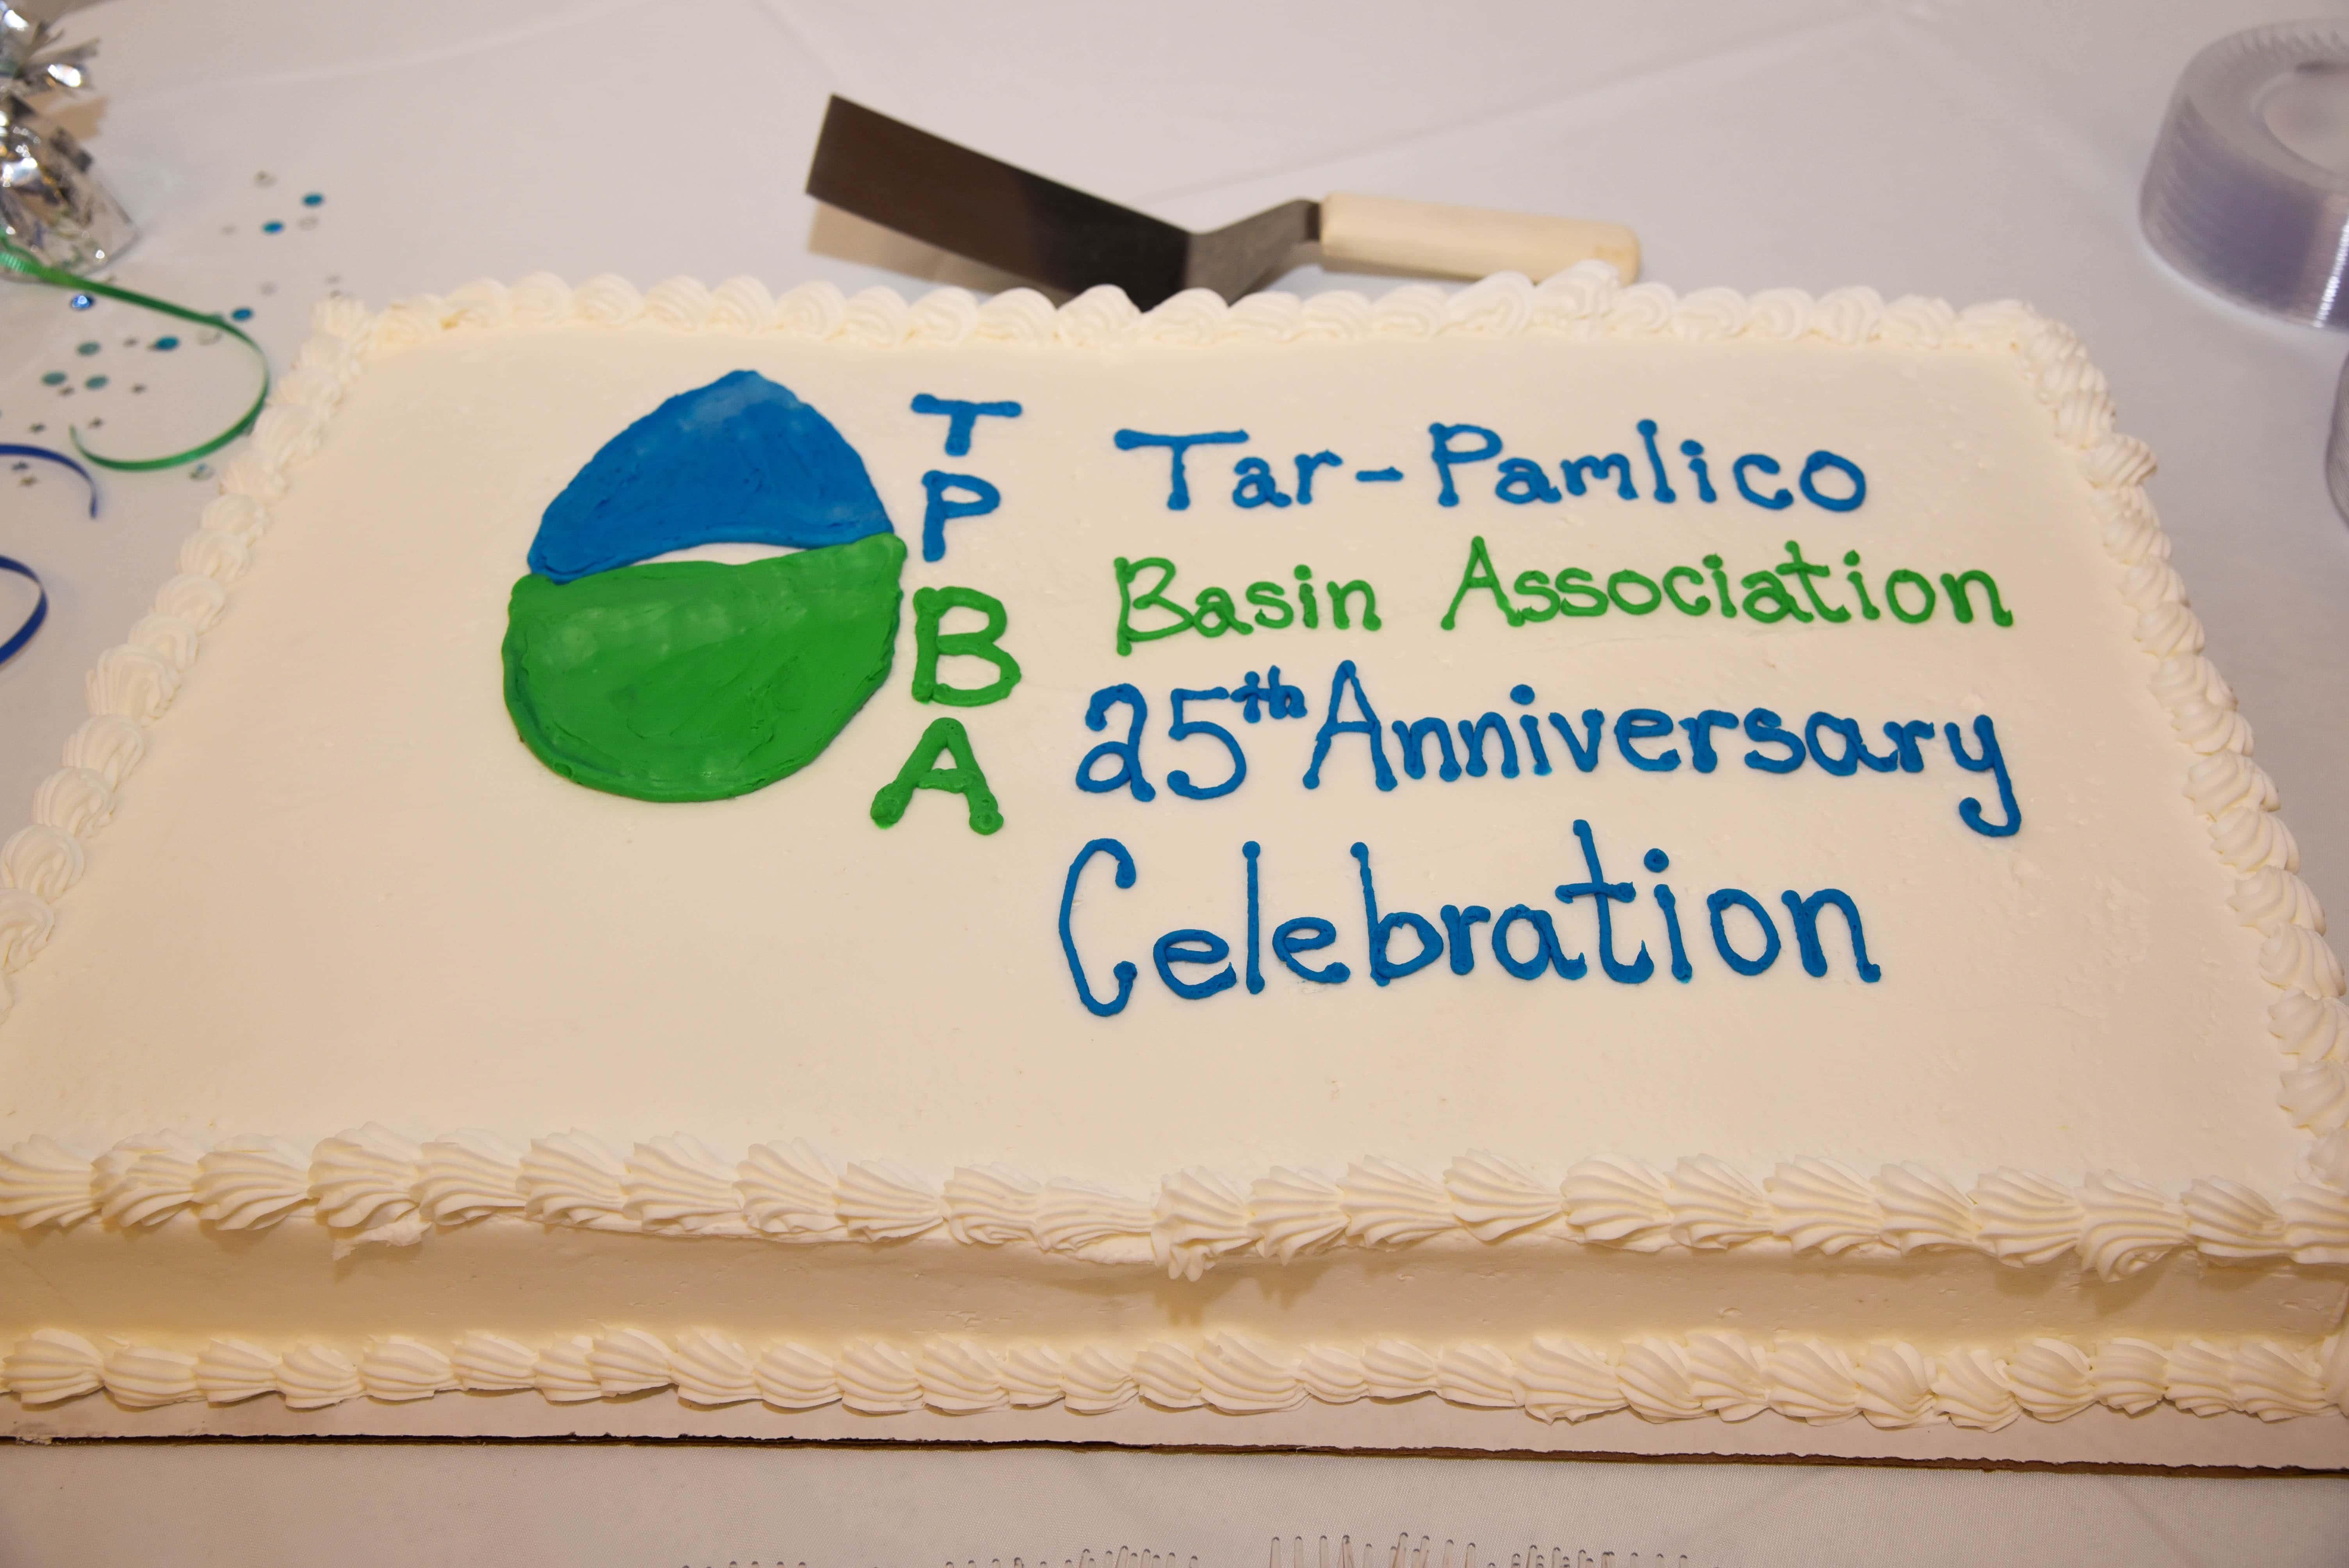 Tar-Pamlico Basin Association - 25th Anniversary Celebration